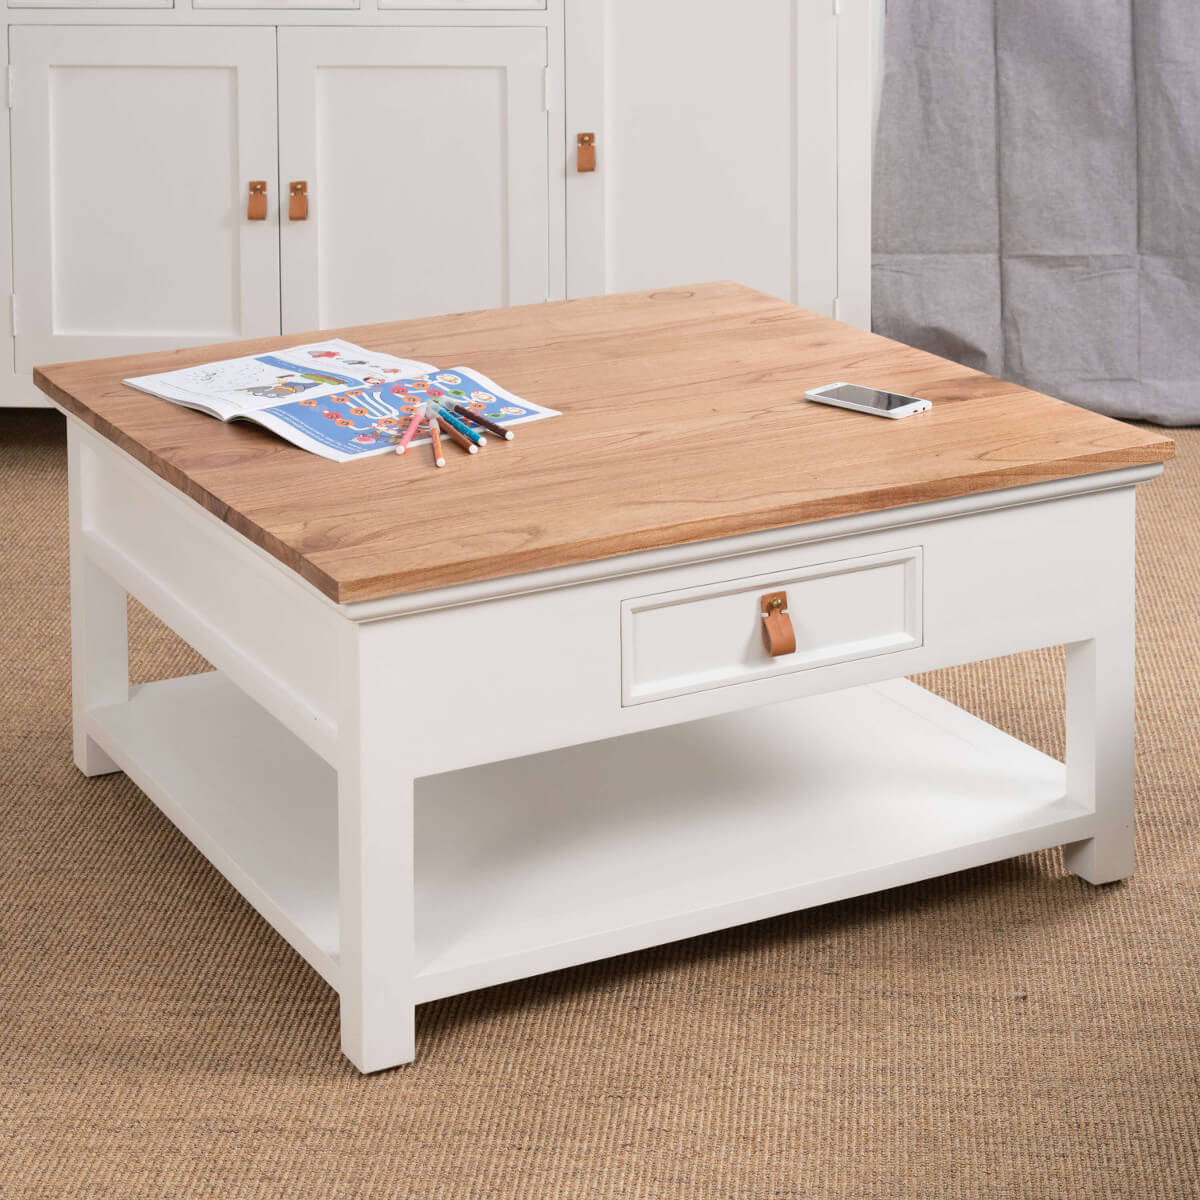 table basse salon chic 90. Black Bedroom Furniture Sets. Home Design Ideas